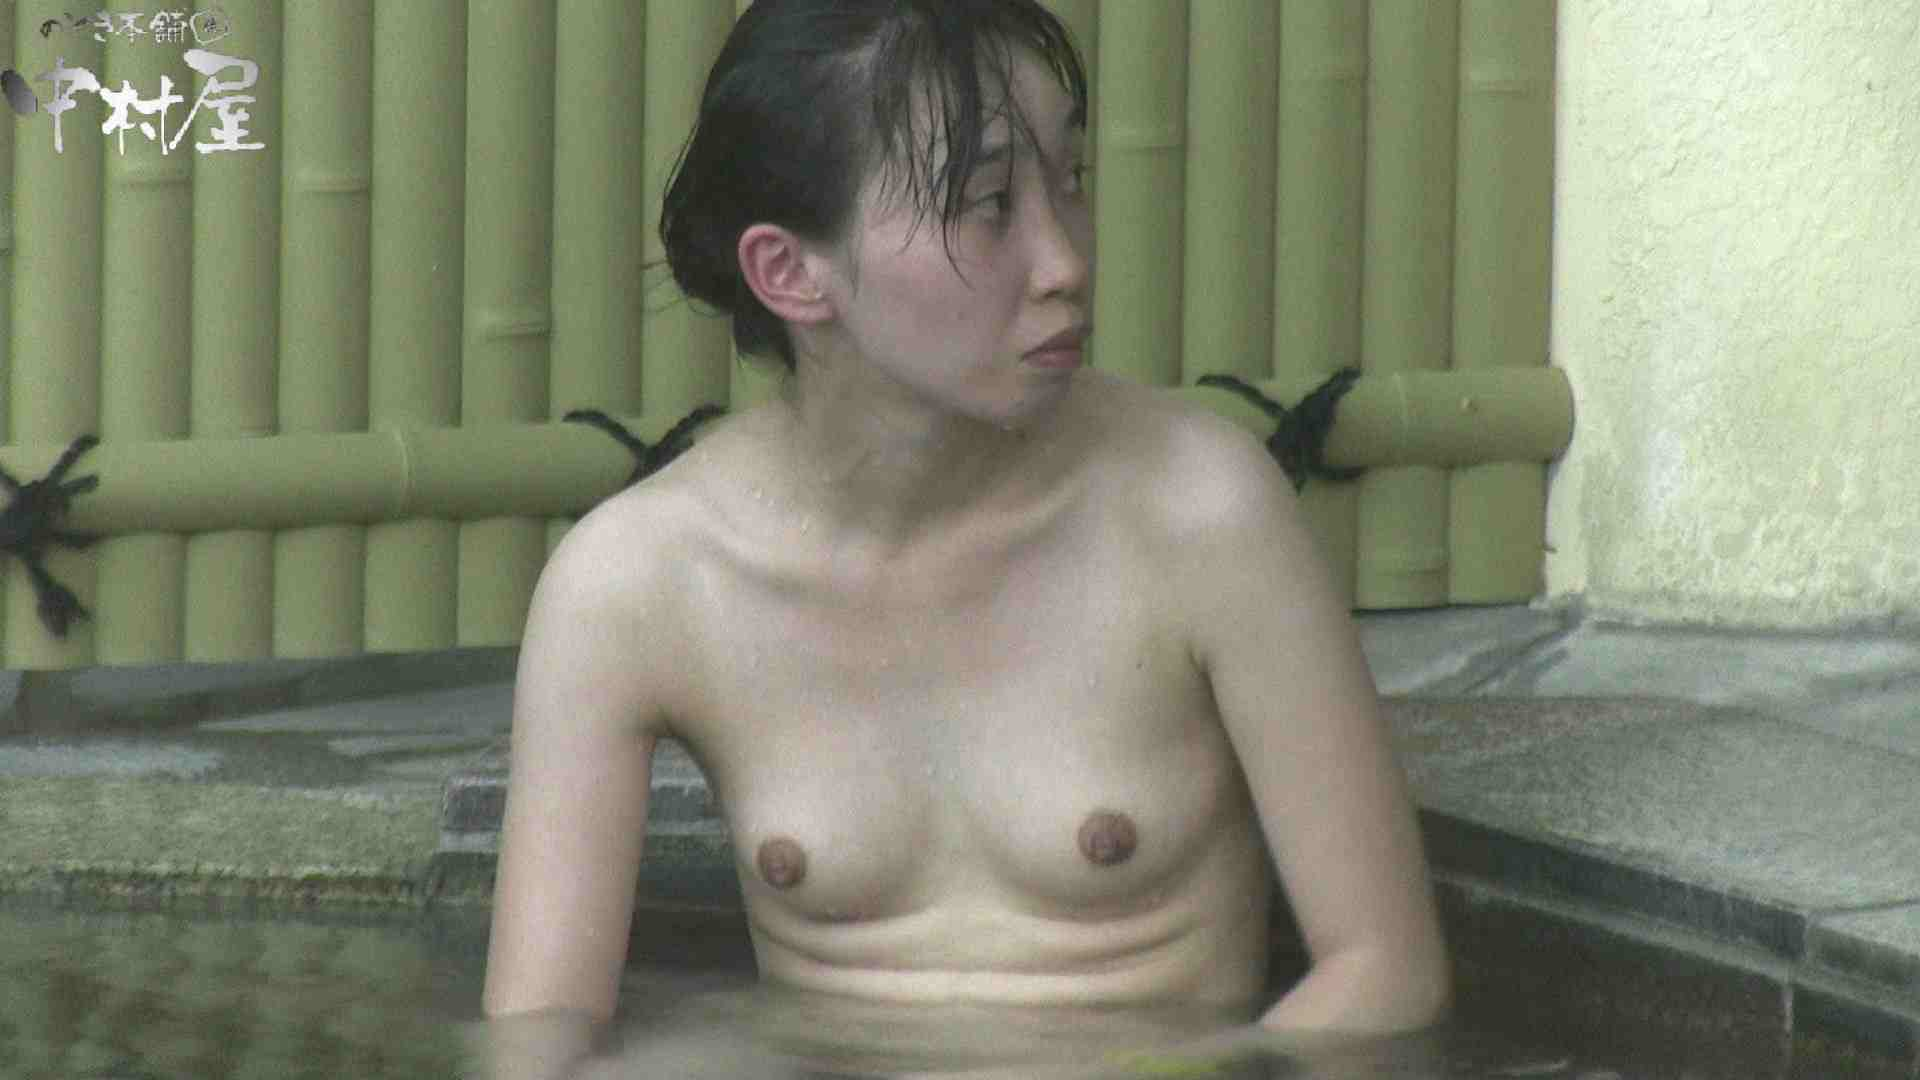 Aquaな露天風呂Vol.910 盗撮シリーズ | 露天風呂編  84PIX 65